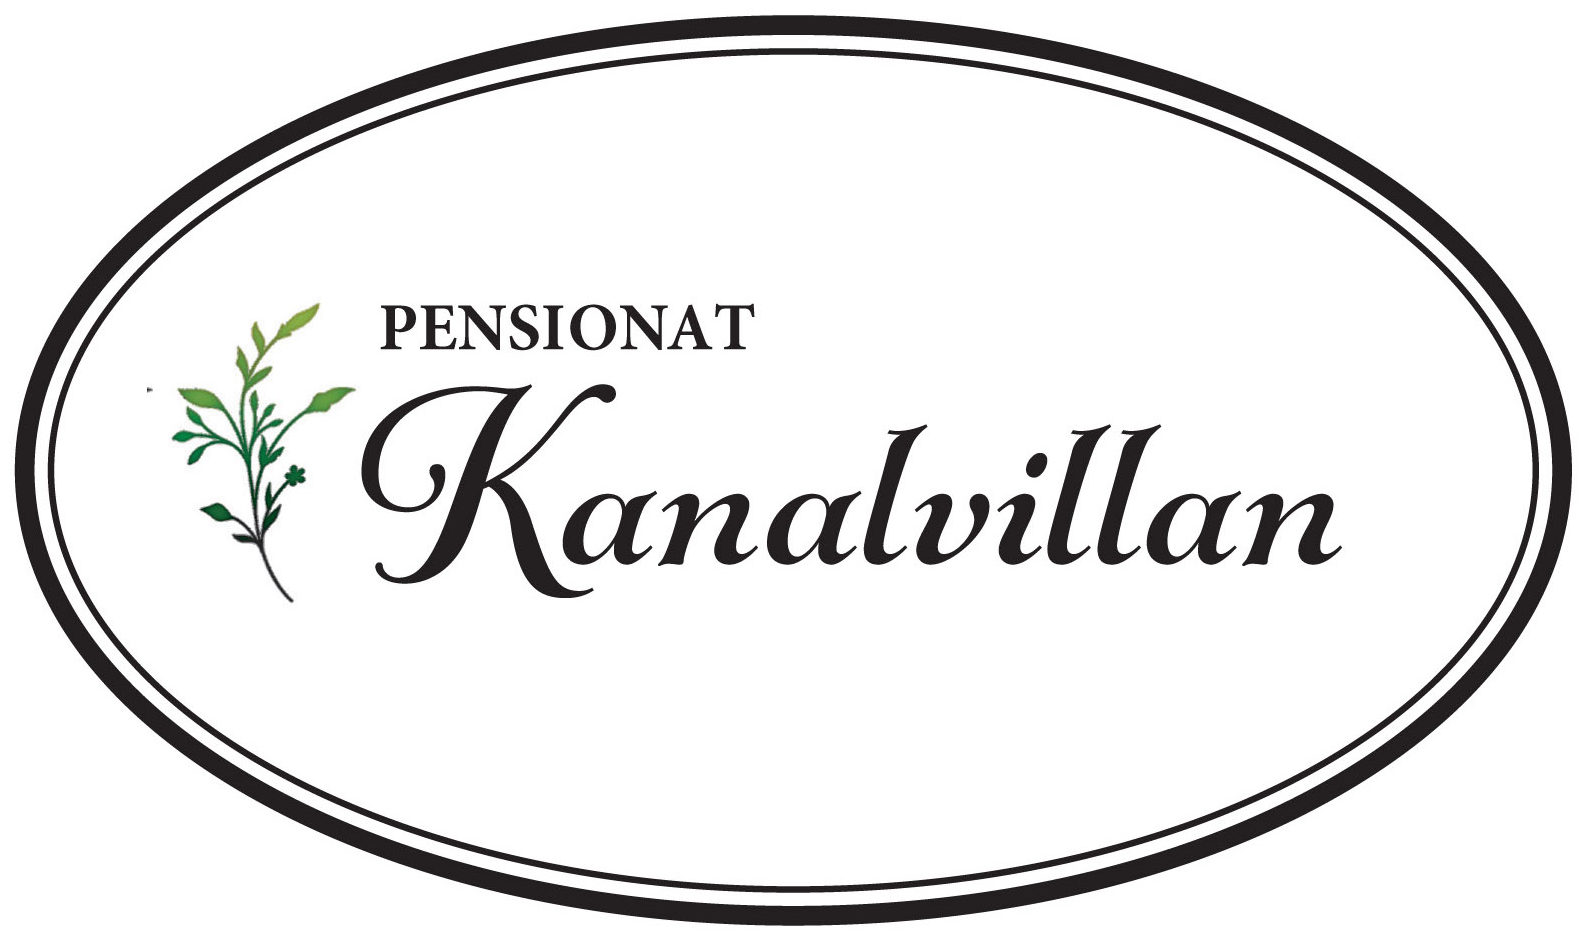 Pensionat Kanalvillan